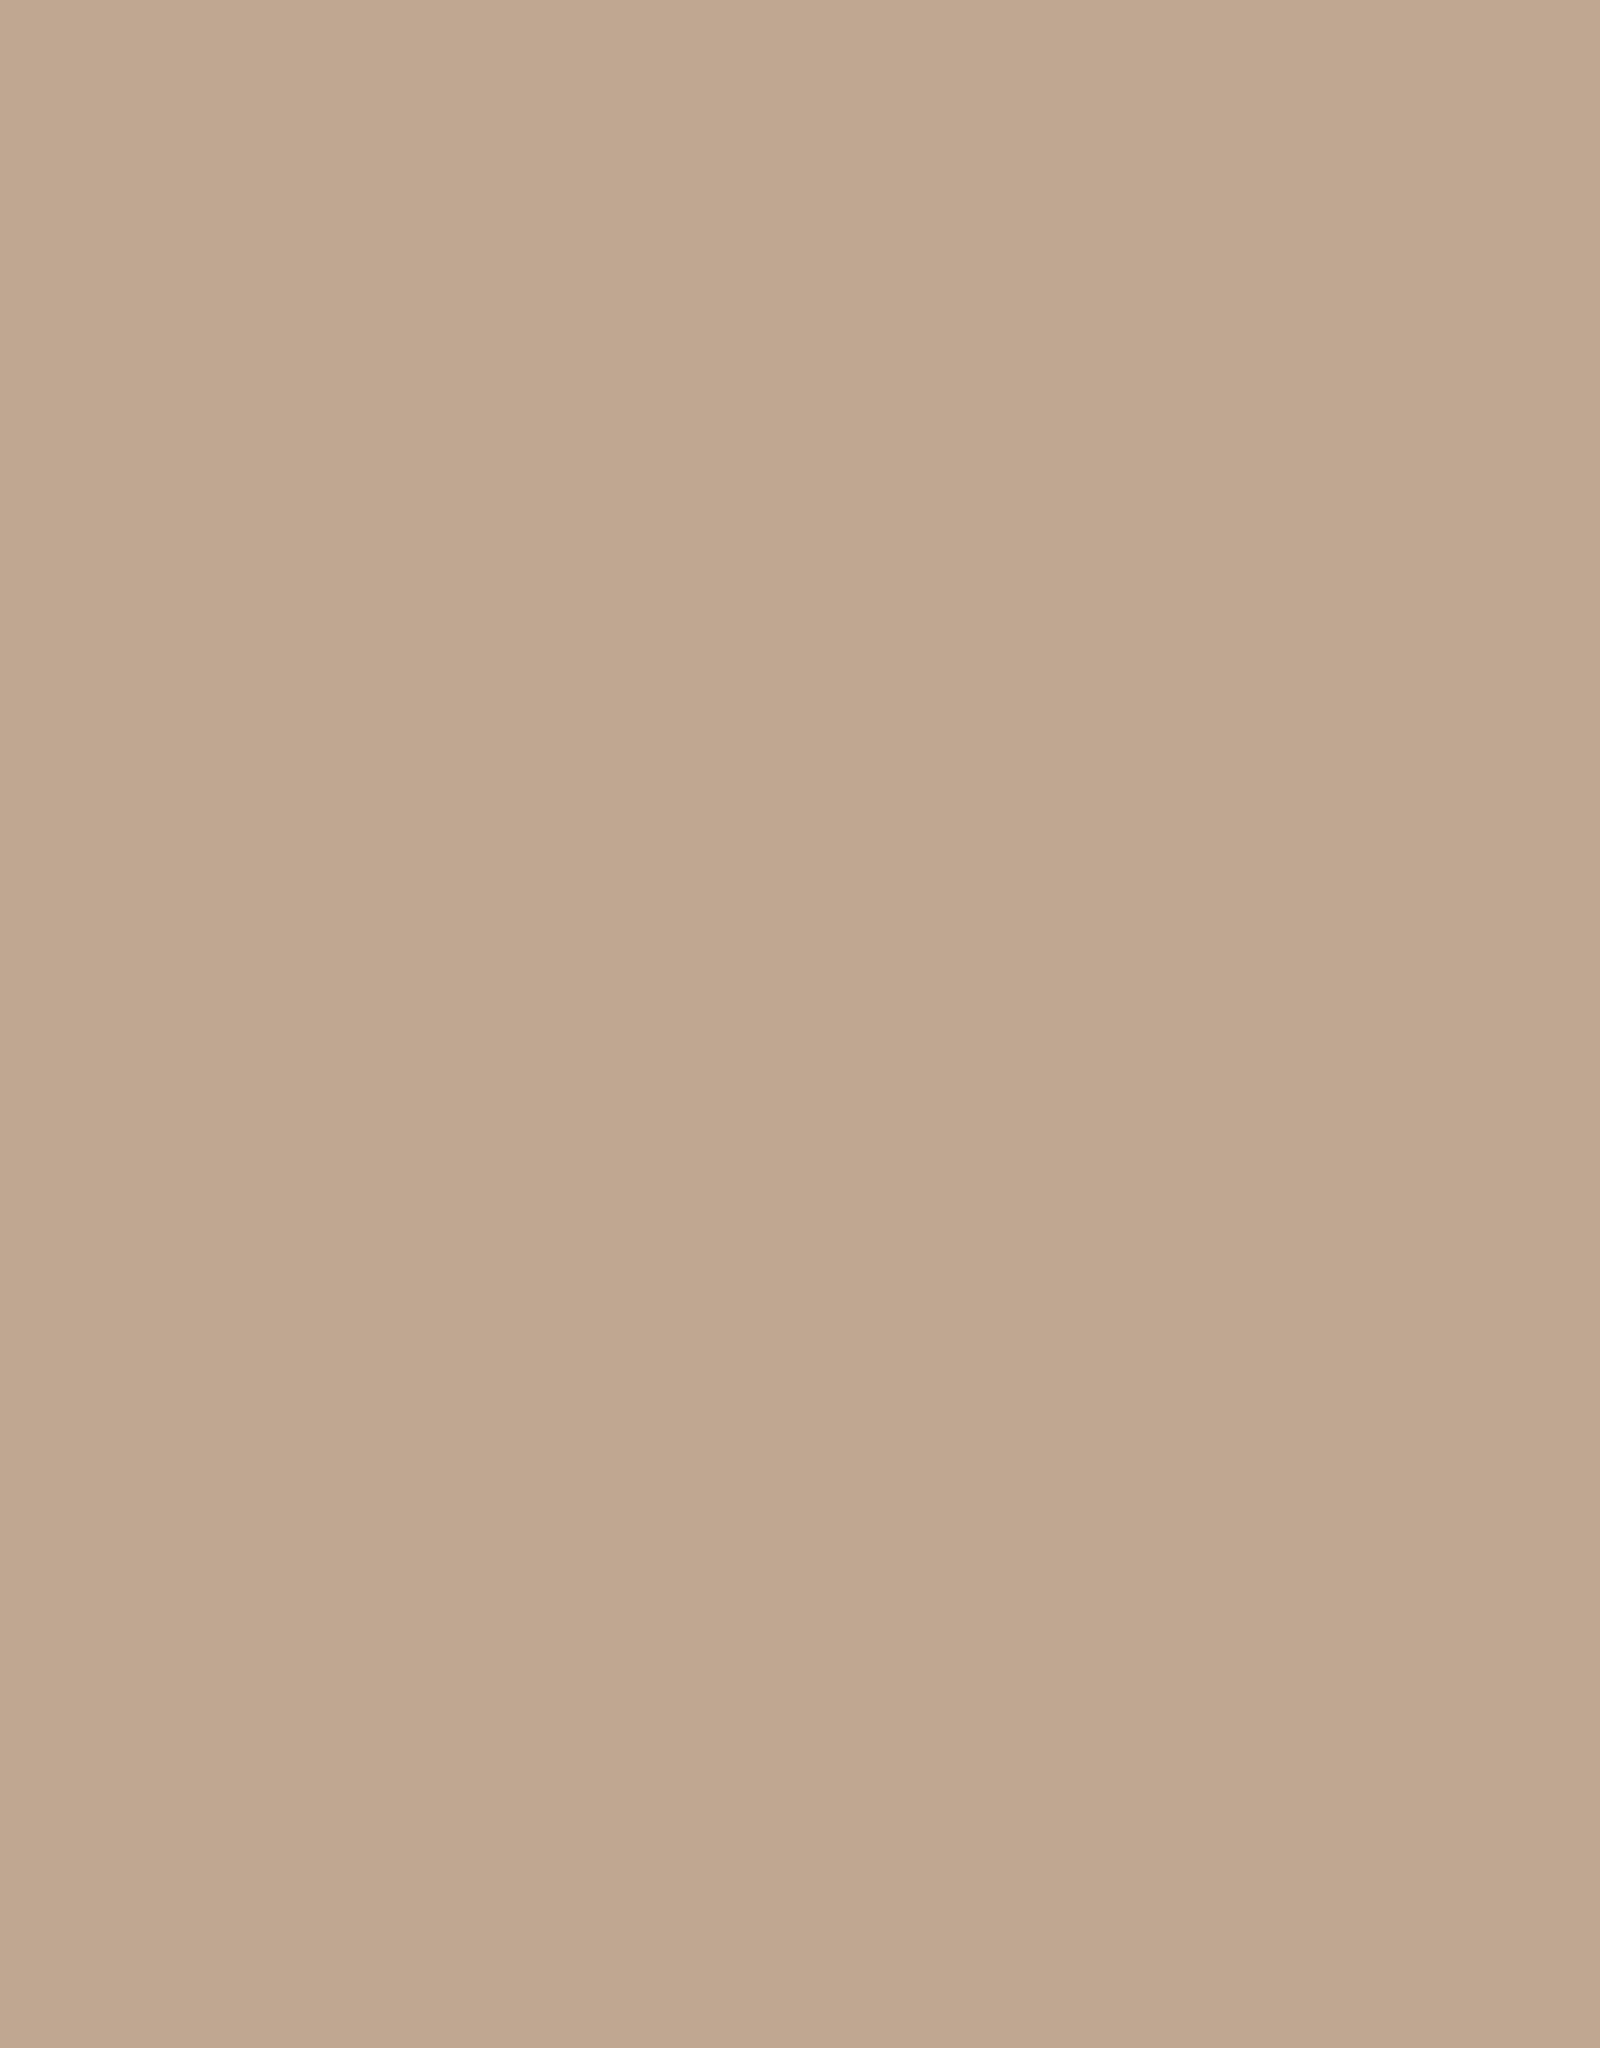 Sennelier, Extra Fine Soft Pastel, Cassel Earth